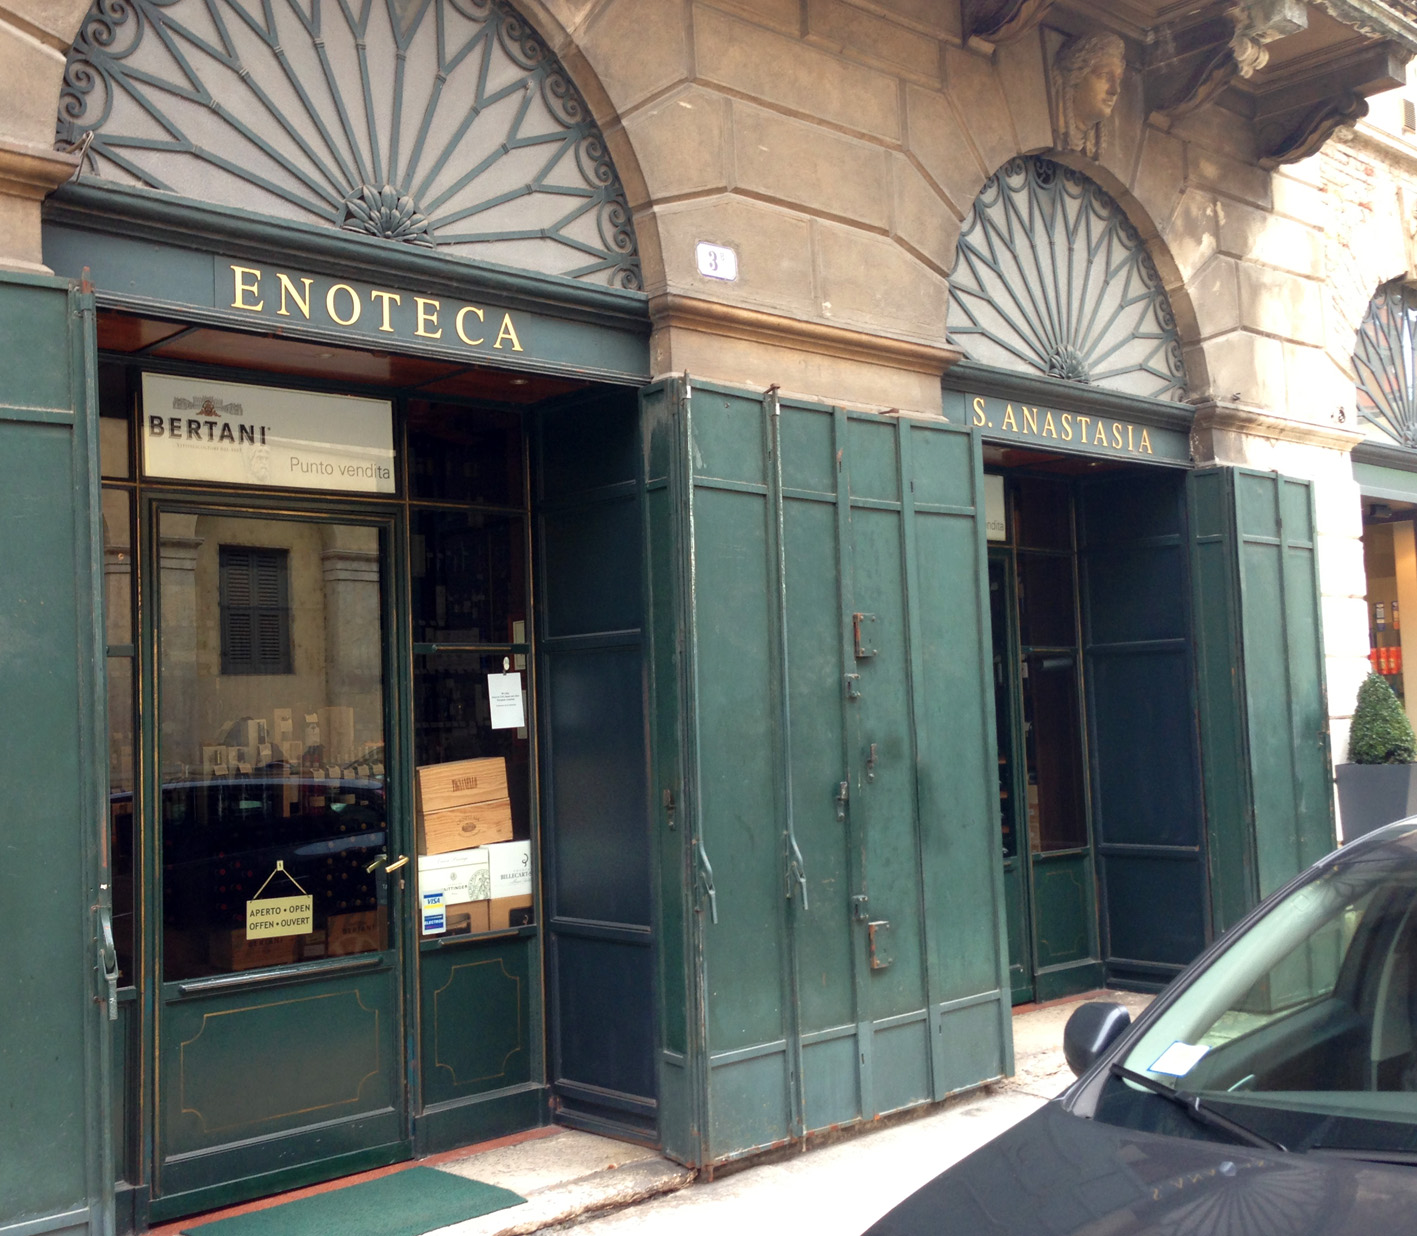 Enoteca in Verona